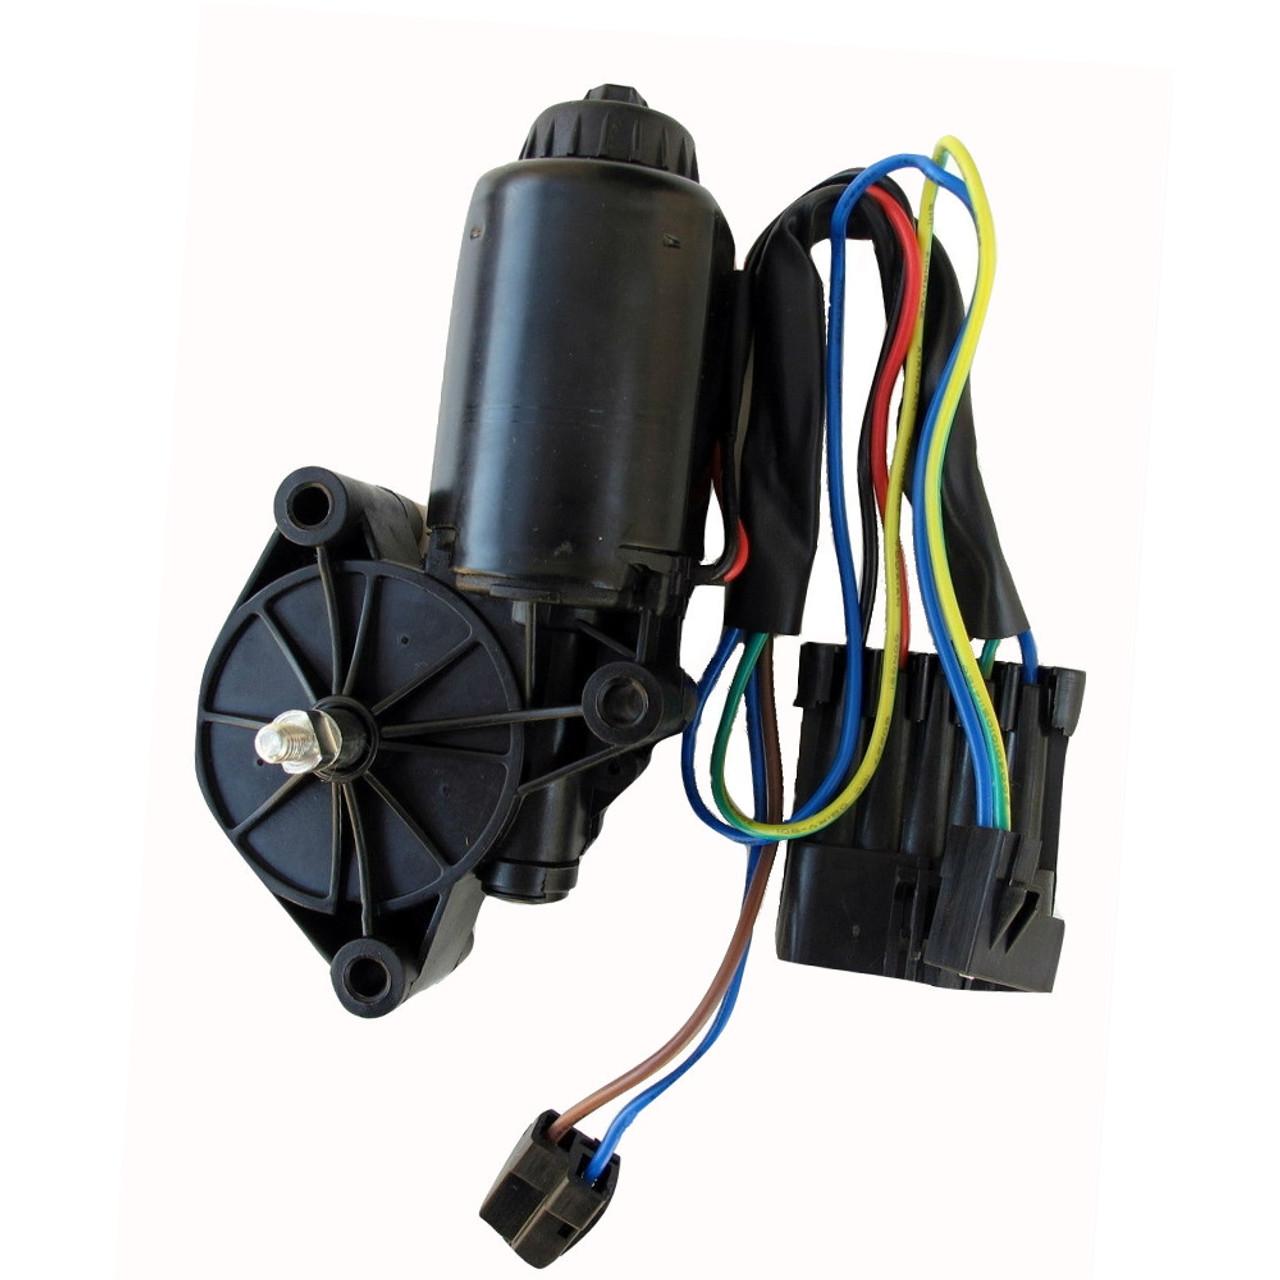 hight resolution of new 1998 2002 firebird headlight actuator motor wire harness rh westcoast autoparts com